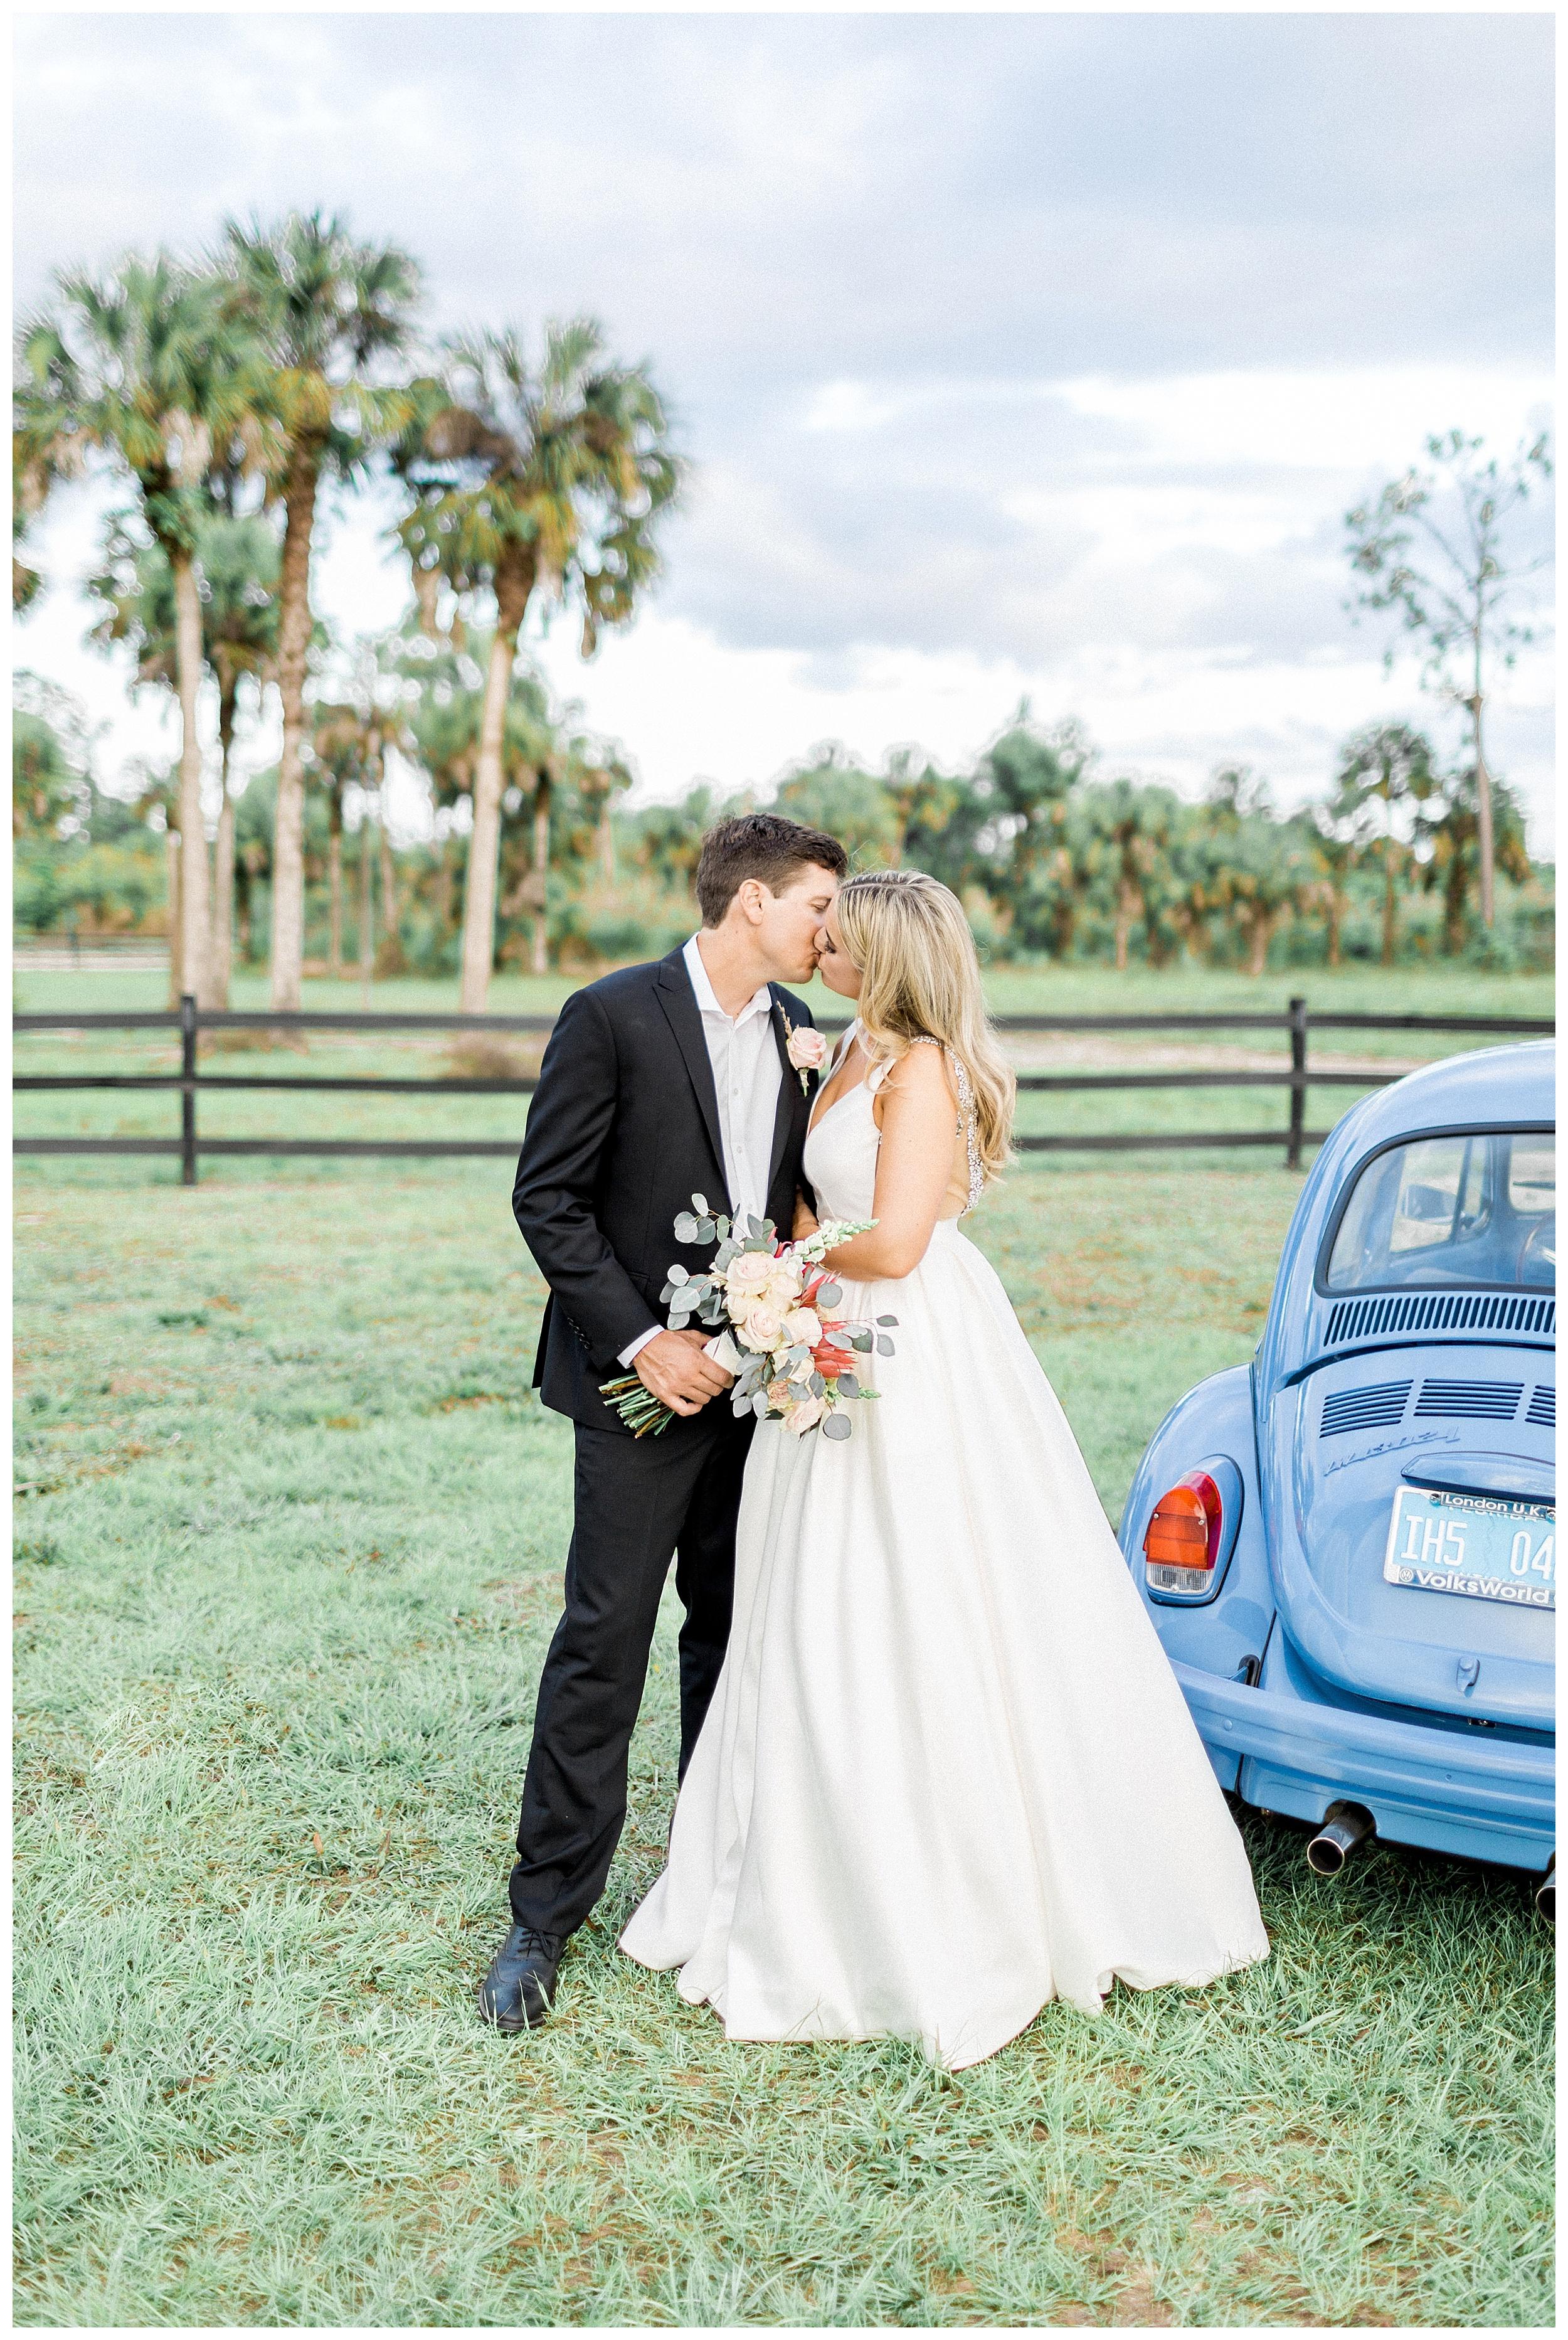 South Florida Wedding Photographer Kir Tuben_0100.jpg